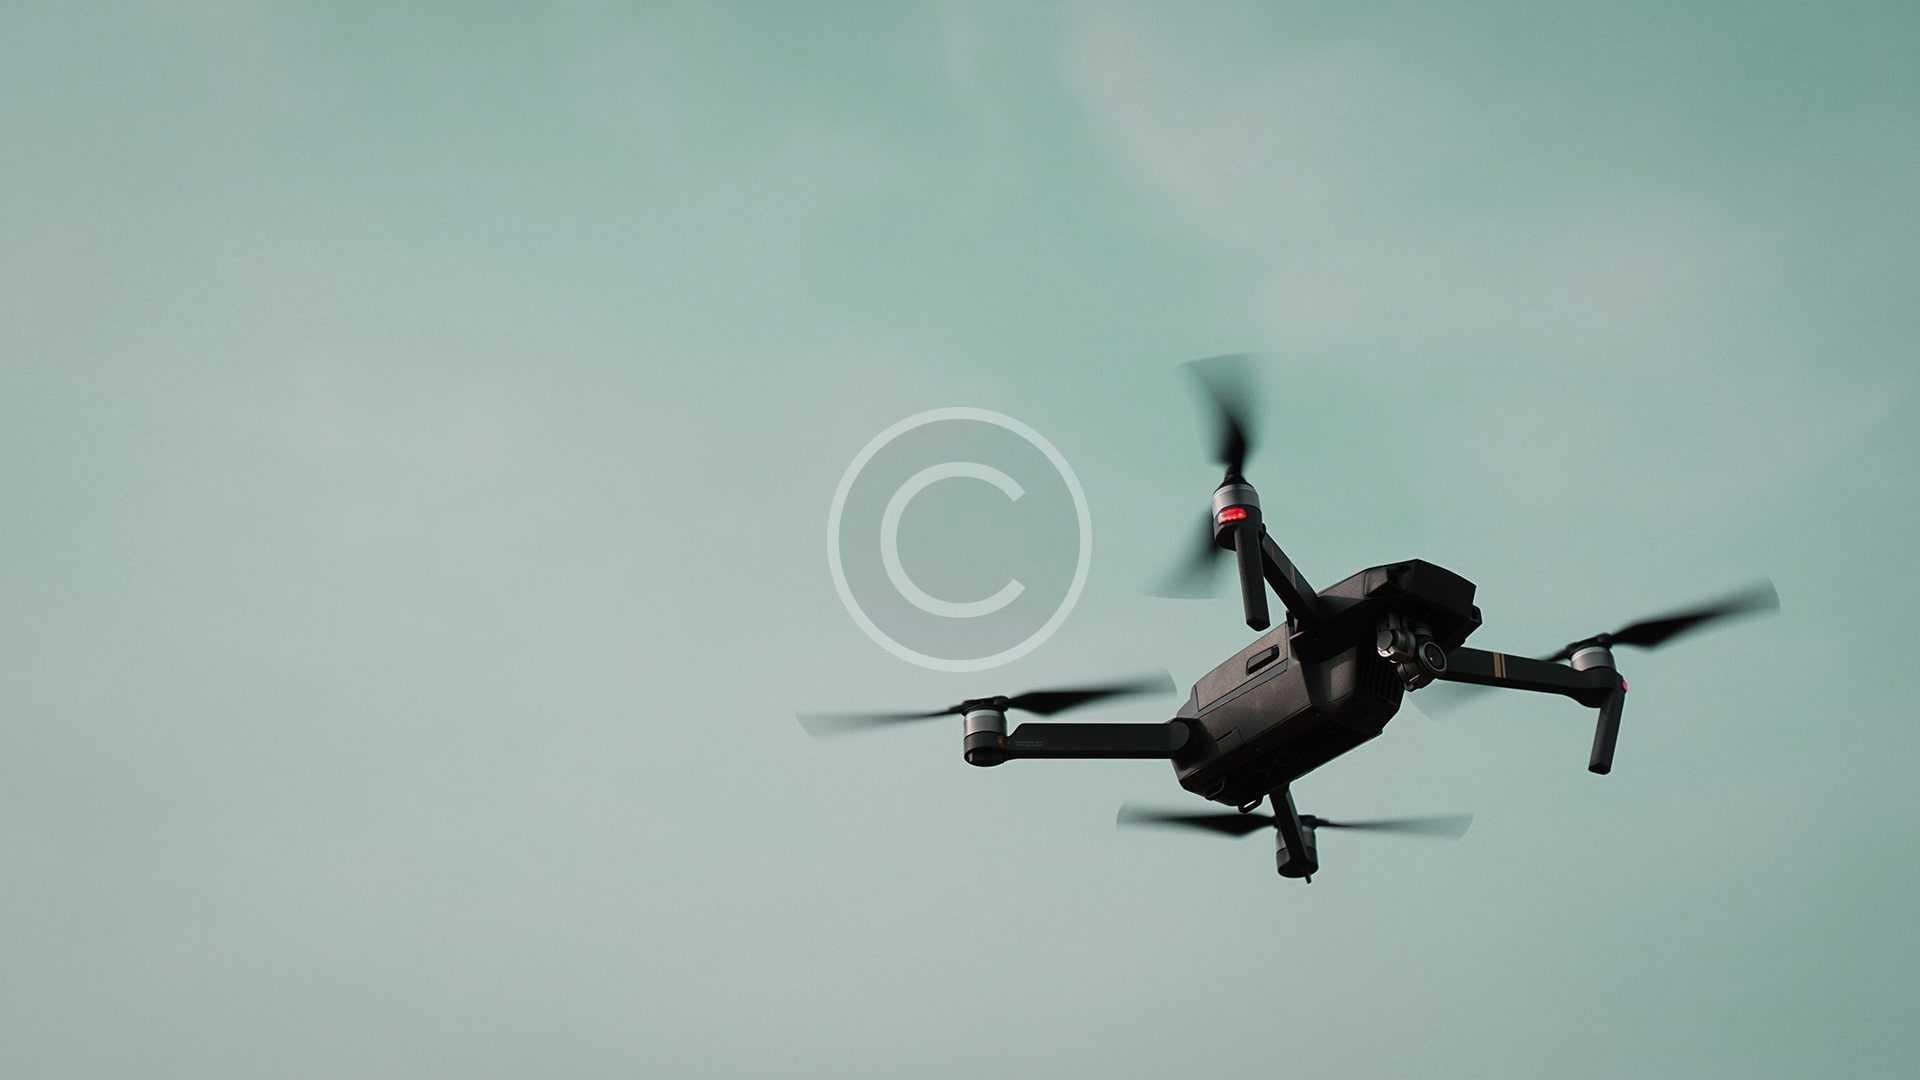 Drones farming project